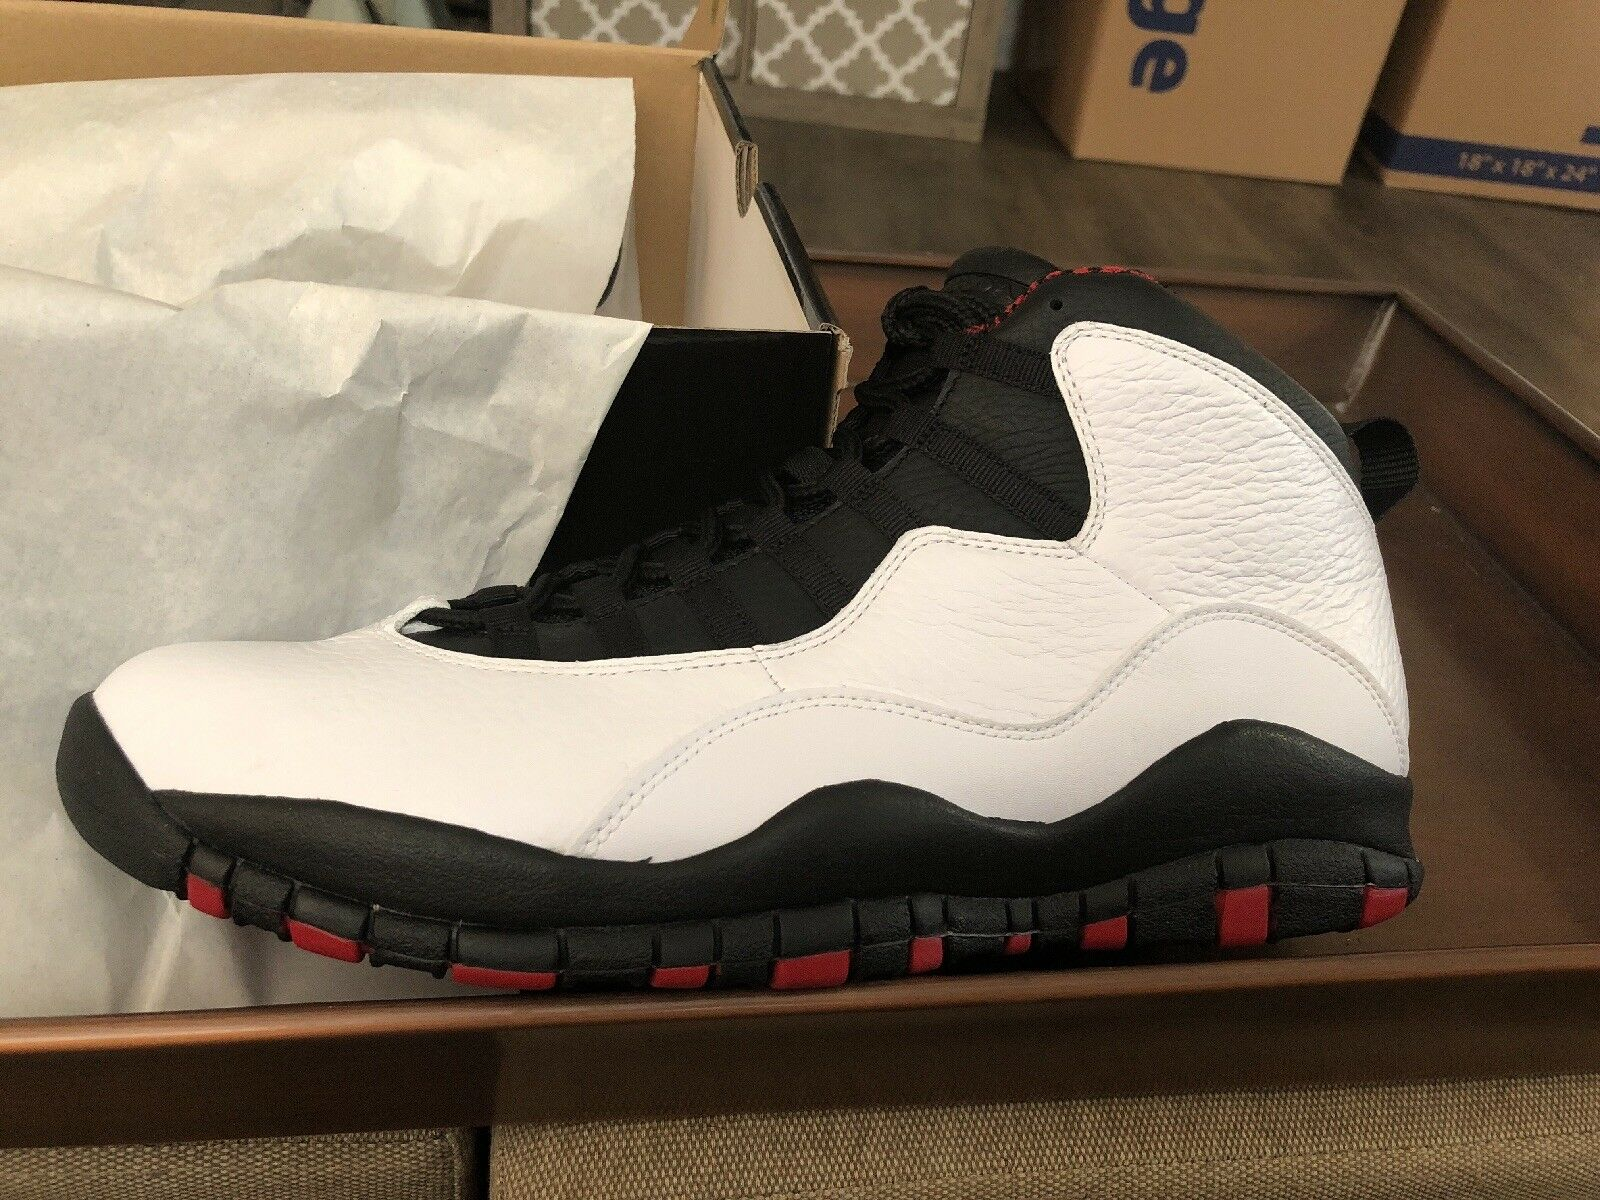 huge selection of 22a2e 3aaff Nike Air Jordan x 10 retro Chicago Bulls blanco blanco Bulls rojo negro  Stealth 310805-100 10,5 estacional de recortes de precios, beneficios de  descuentos ...